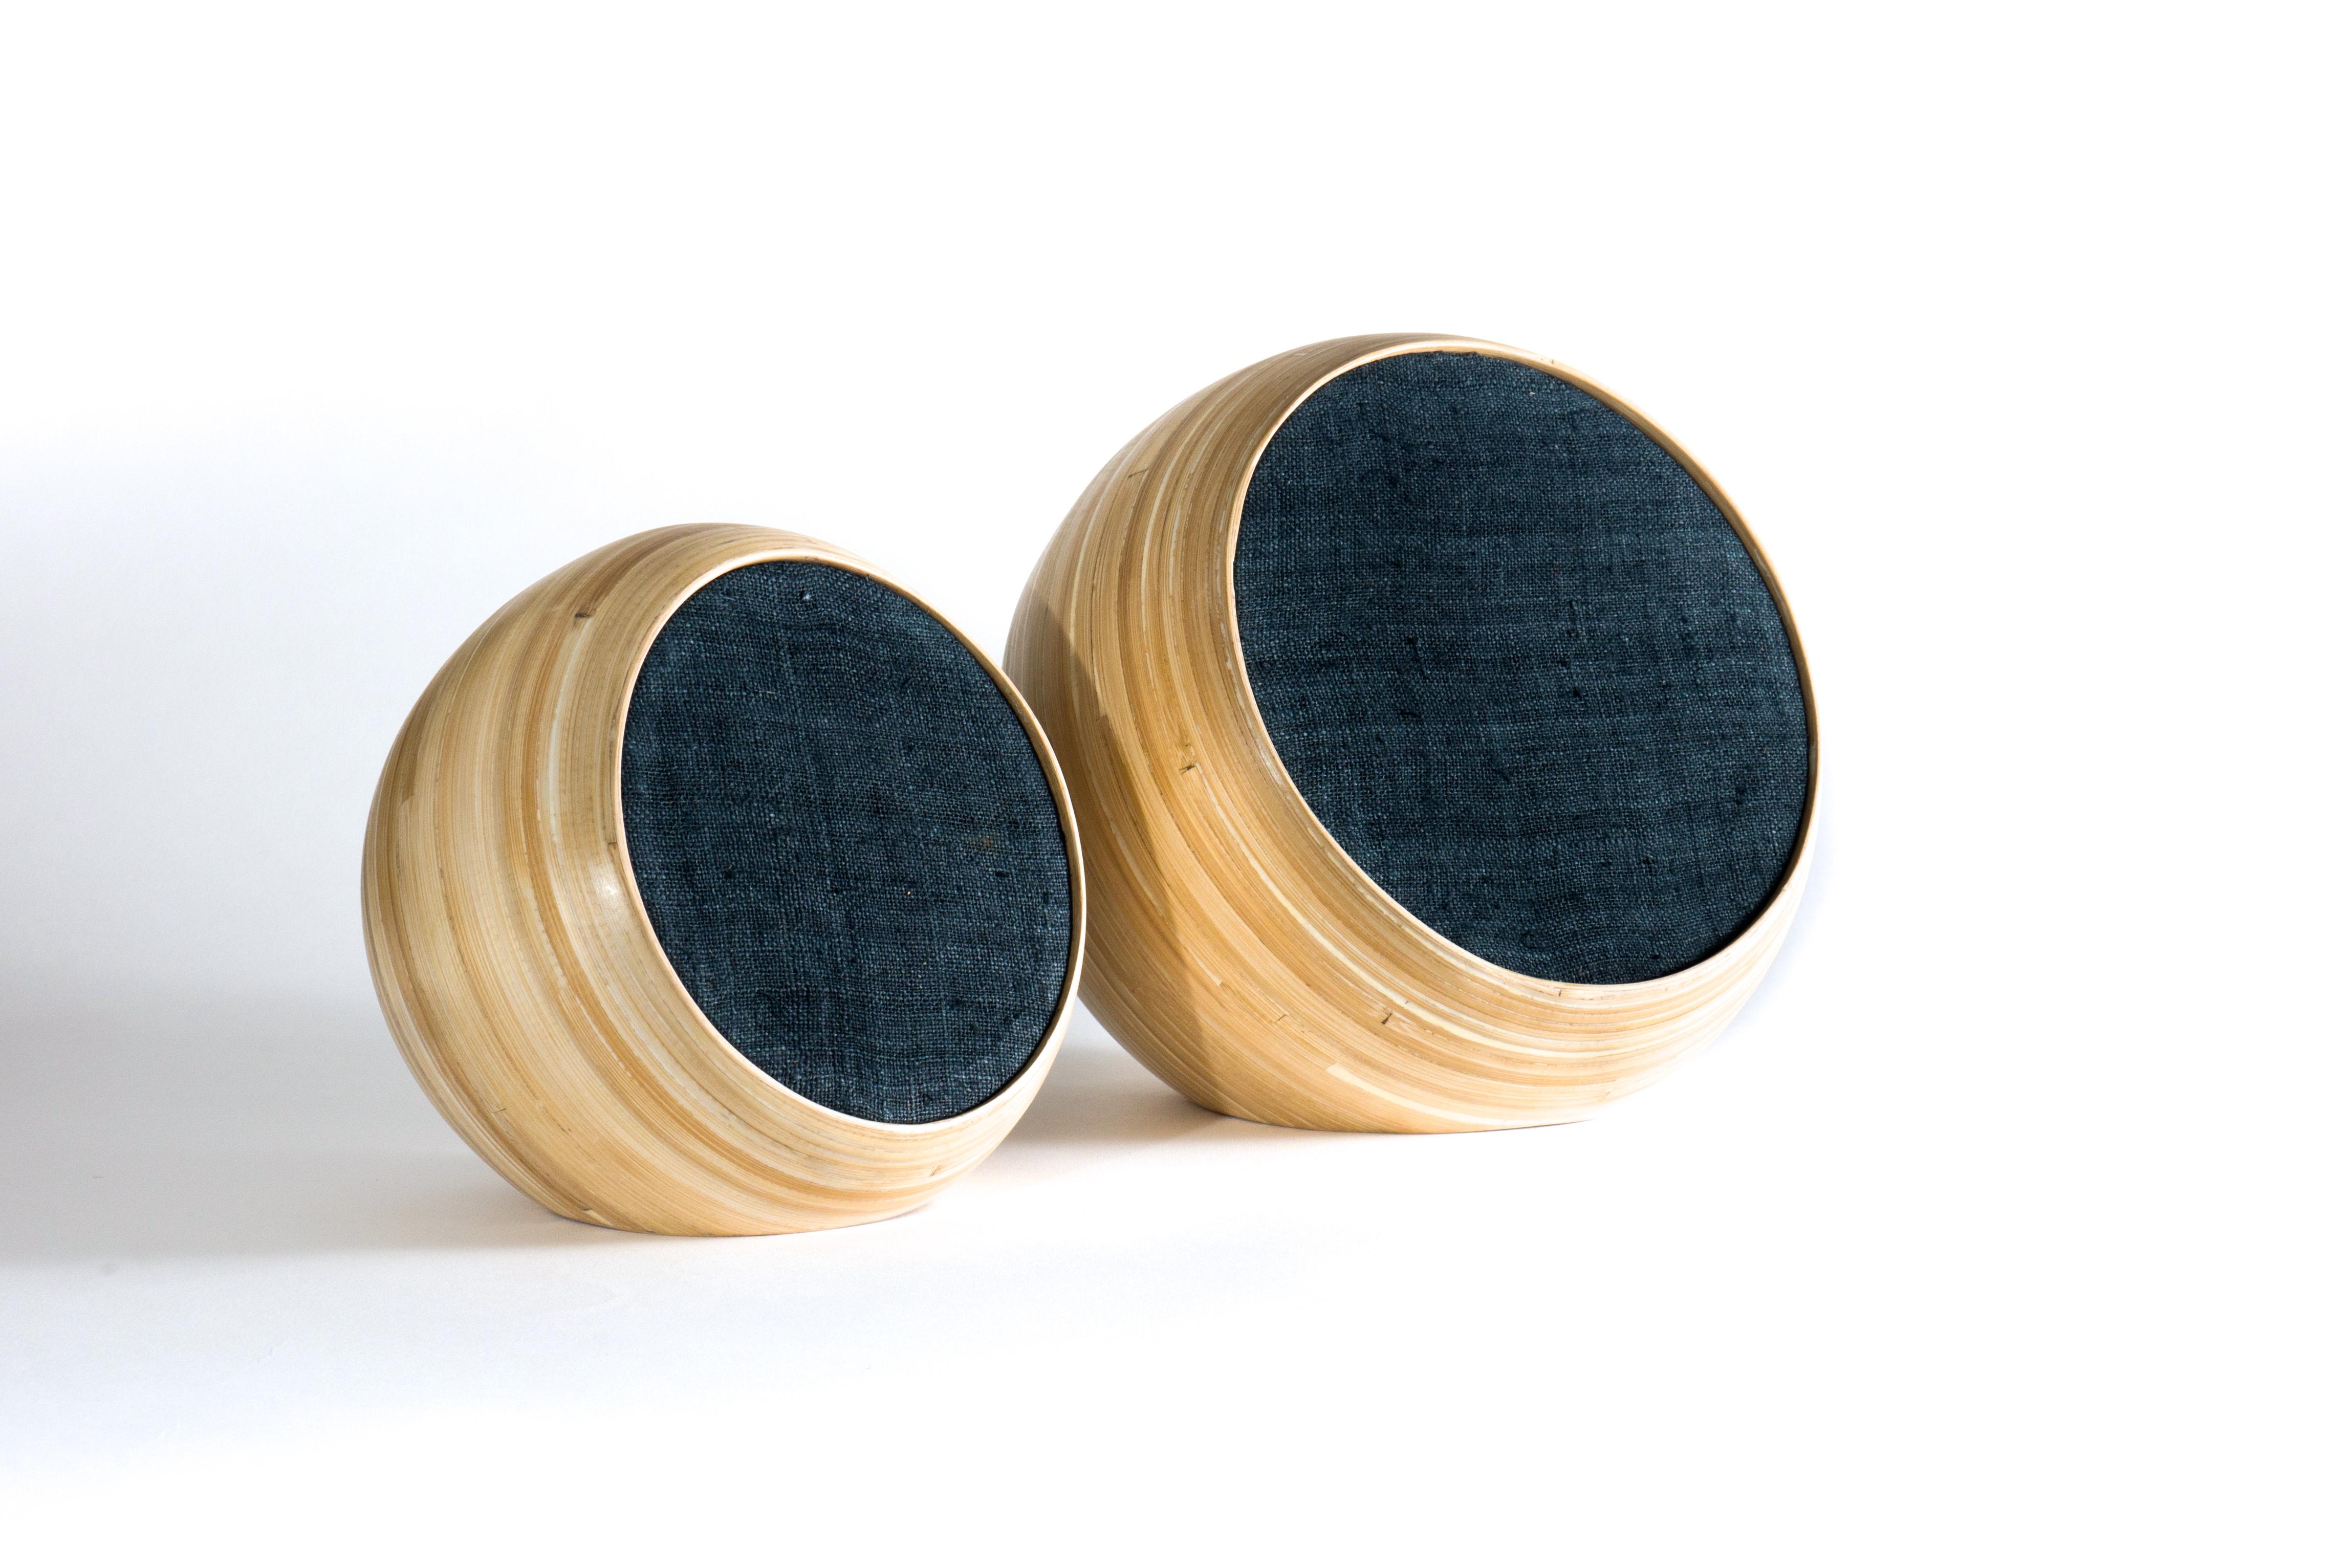 test de la hazang b une enceinte bluetooth en bambou. Black Bedroom Furniture Sets. Home Design Ideas